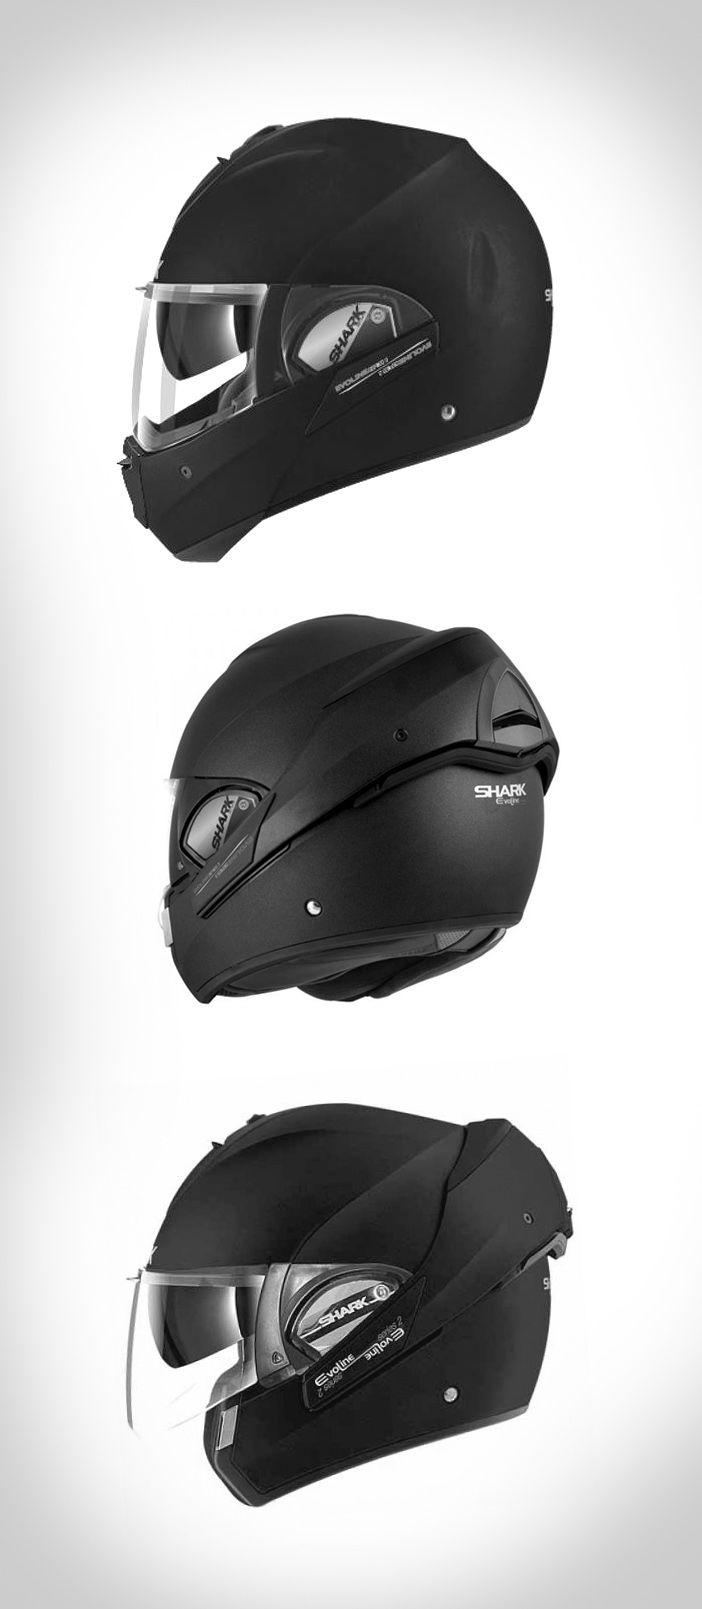 Shark Evoline 3 matte black, what a beautiful and practical helmet!